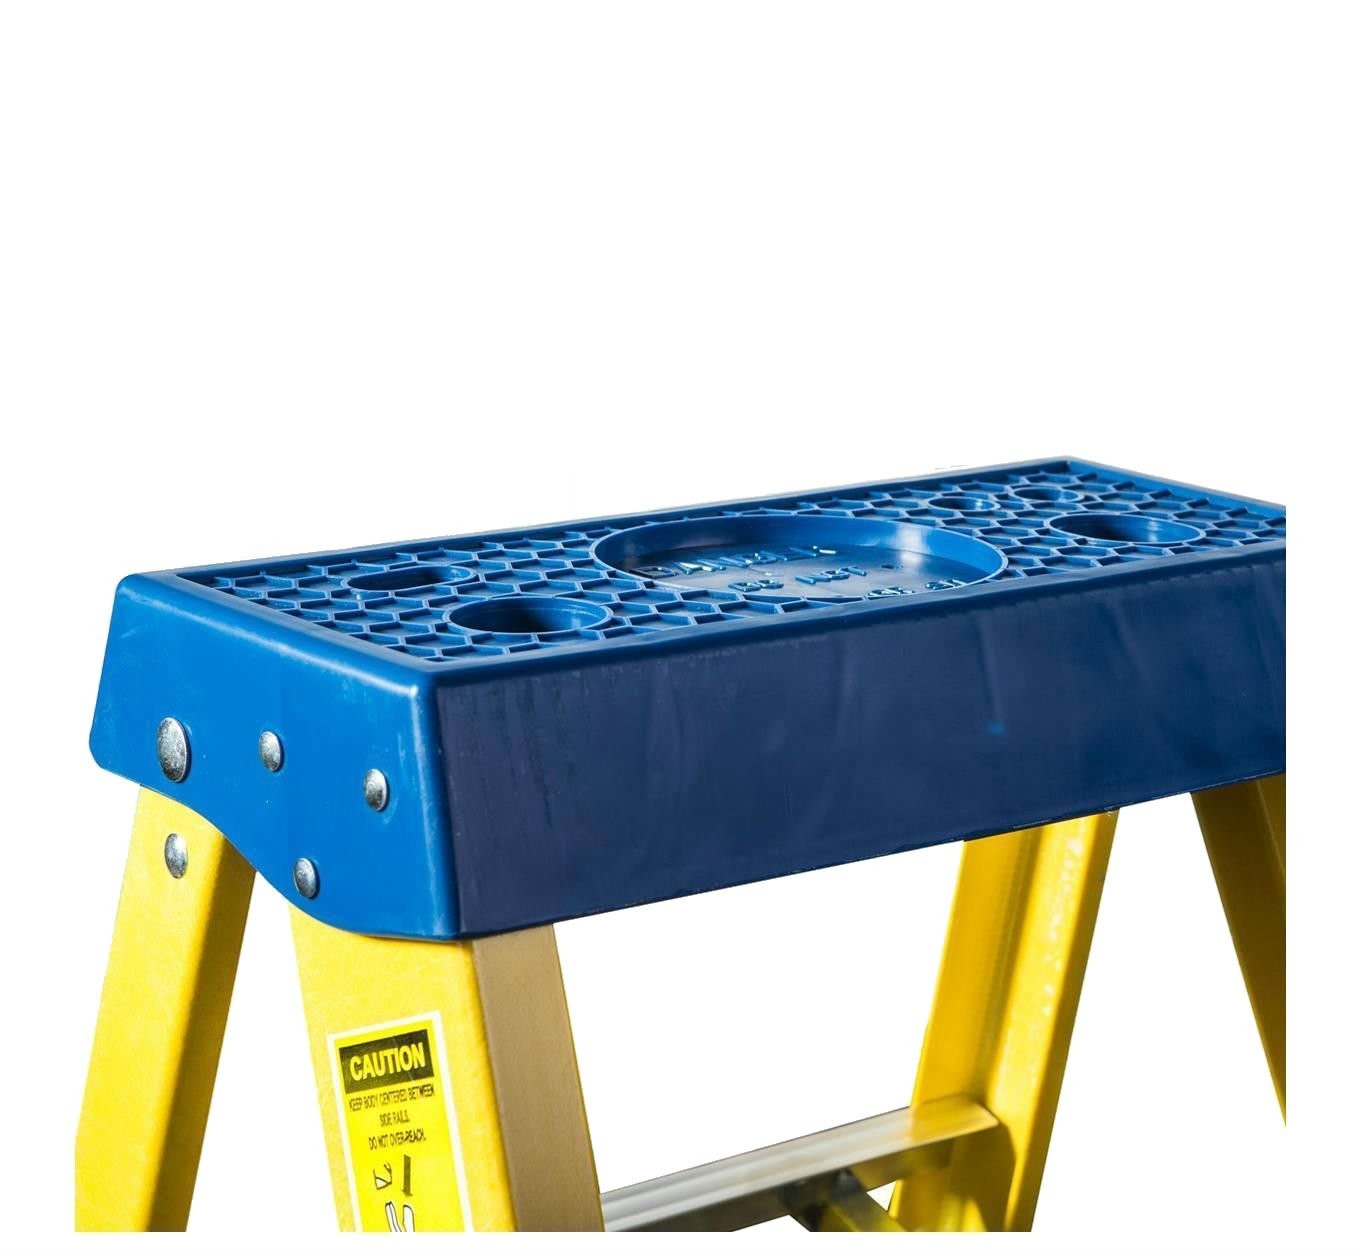 8 Tread DJM Direct Electricians Heavy Duty Tread EN131 Fibreglass Step Ladder 30000v